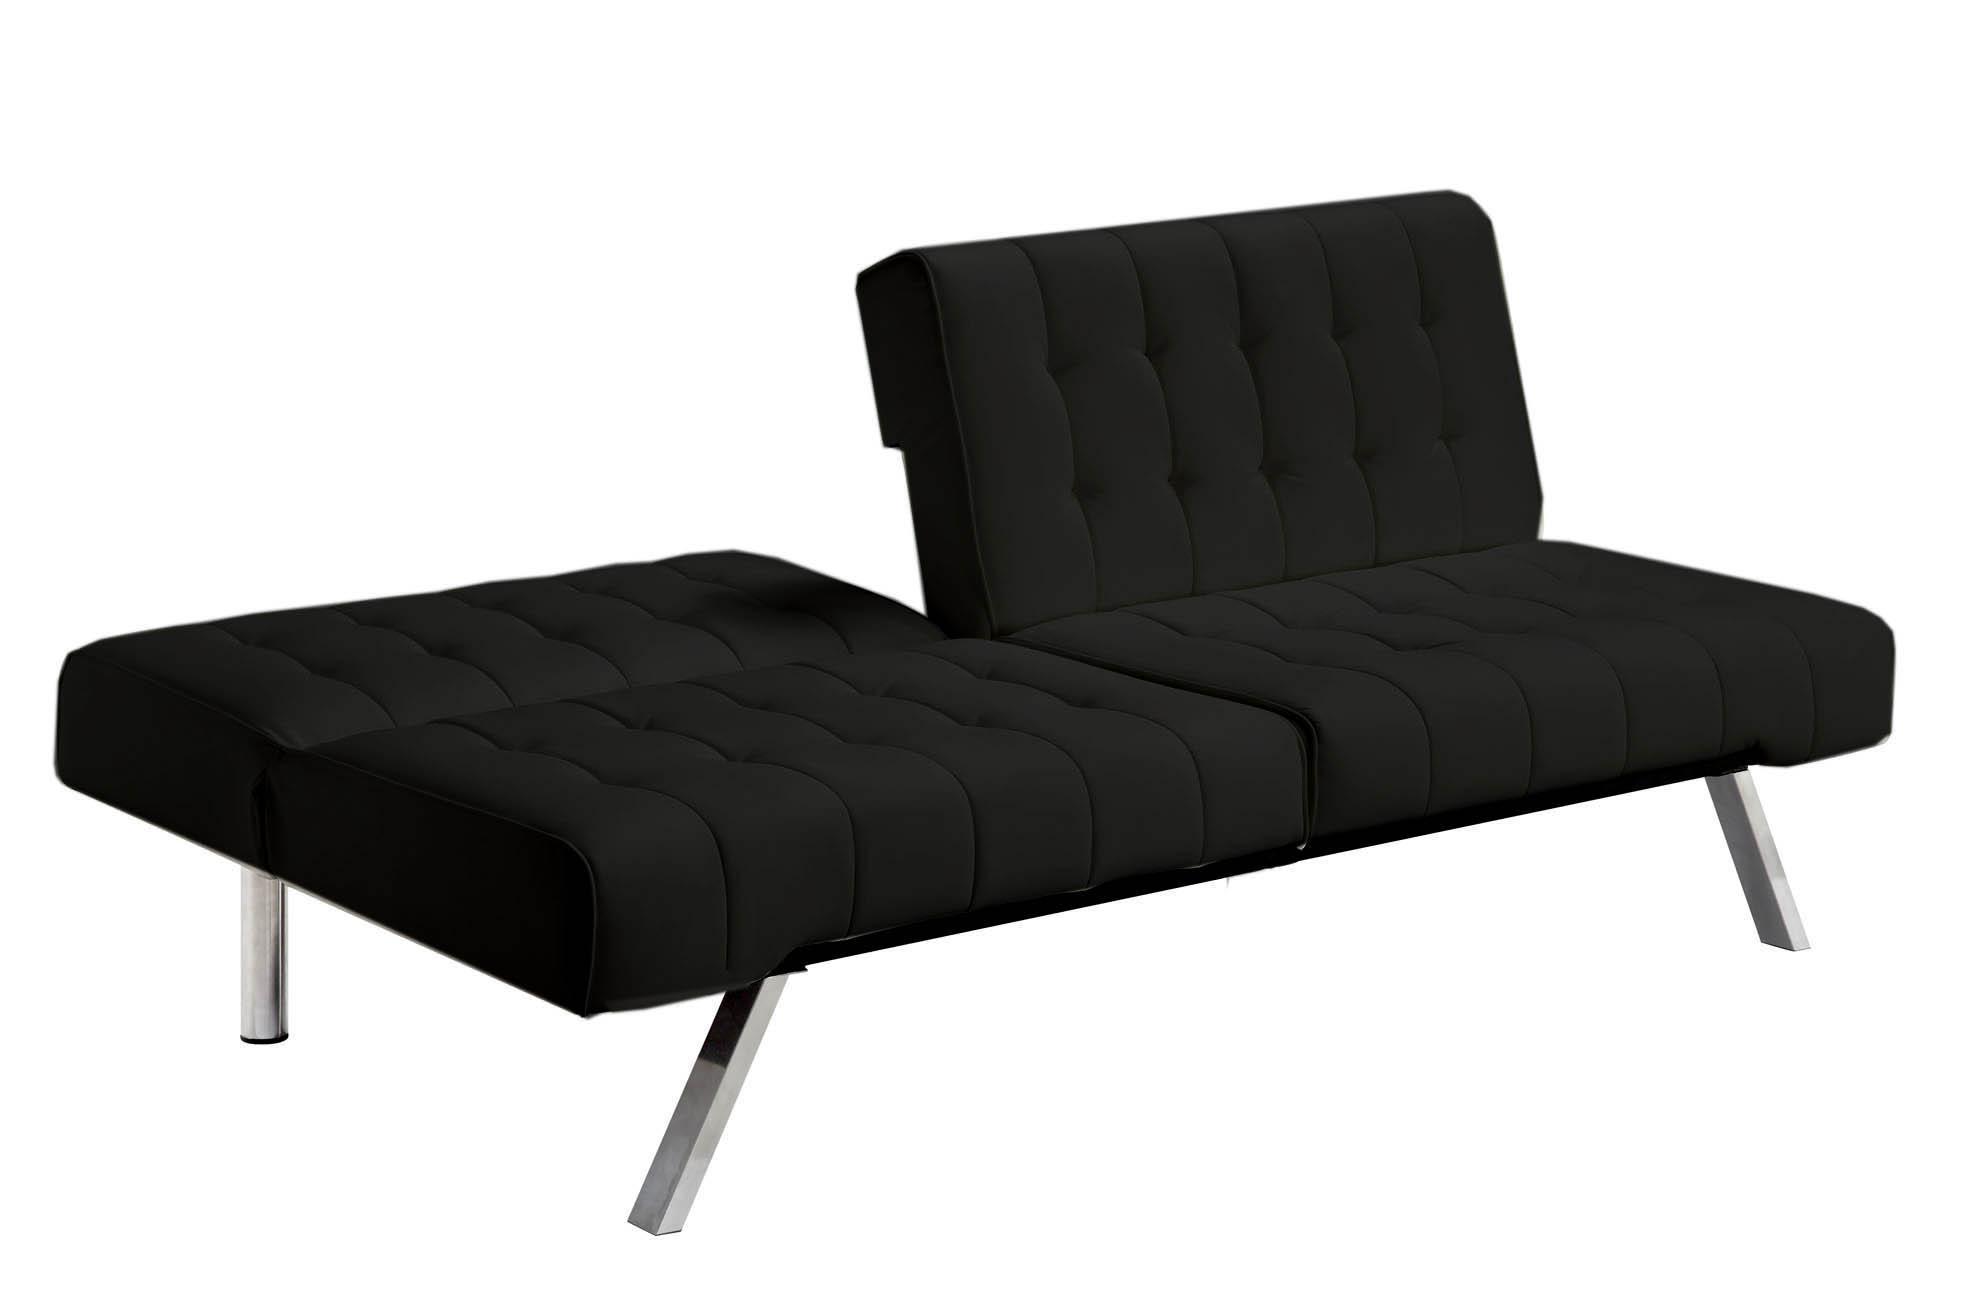 Furniture Home Goods Appliances Athletic Gear Fitness  : 31990984jpgdhpemilyconvertiblefutonspl from www.ojcommerce.com size 1969 x 1313 jpeg 68kB